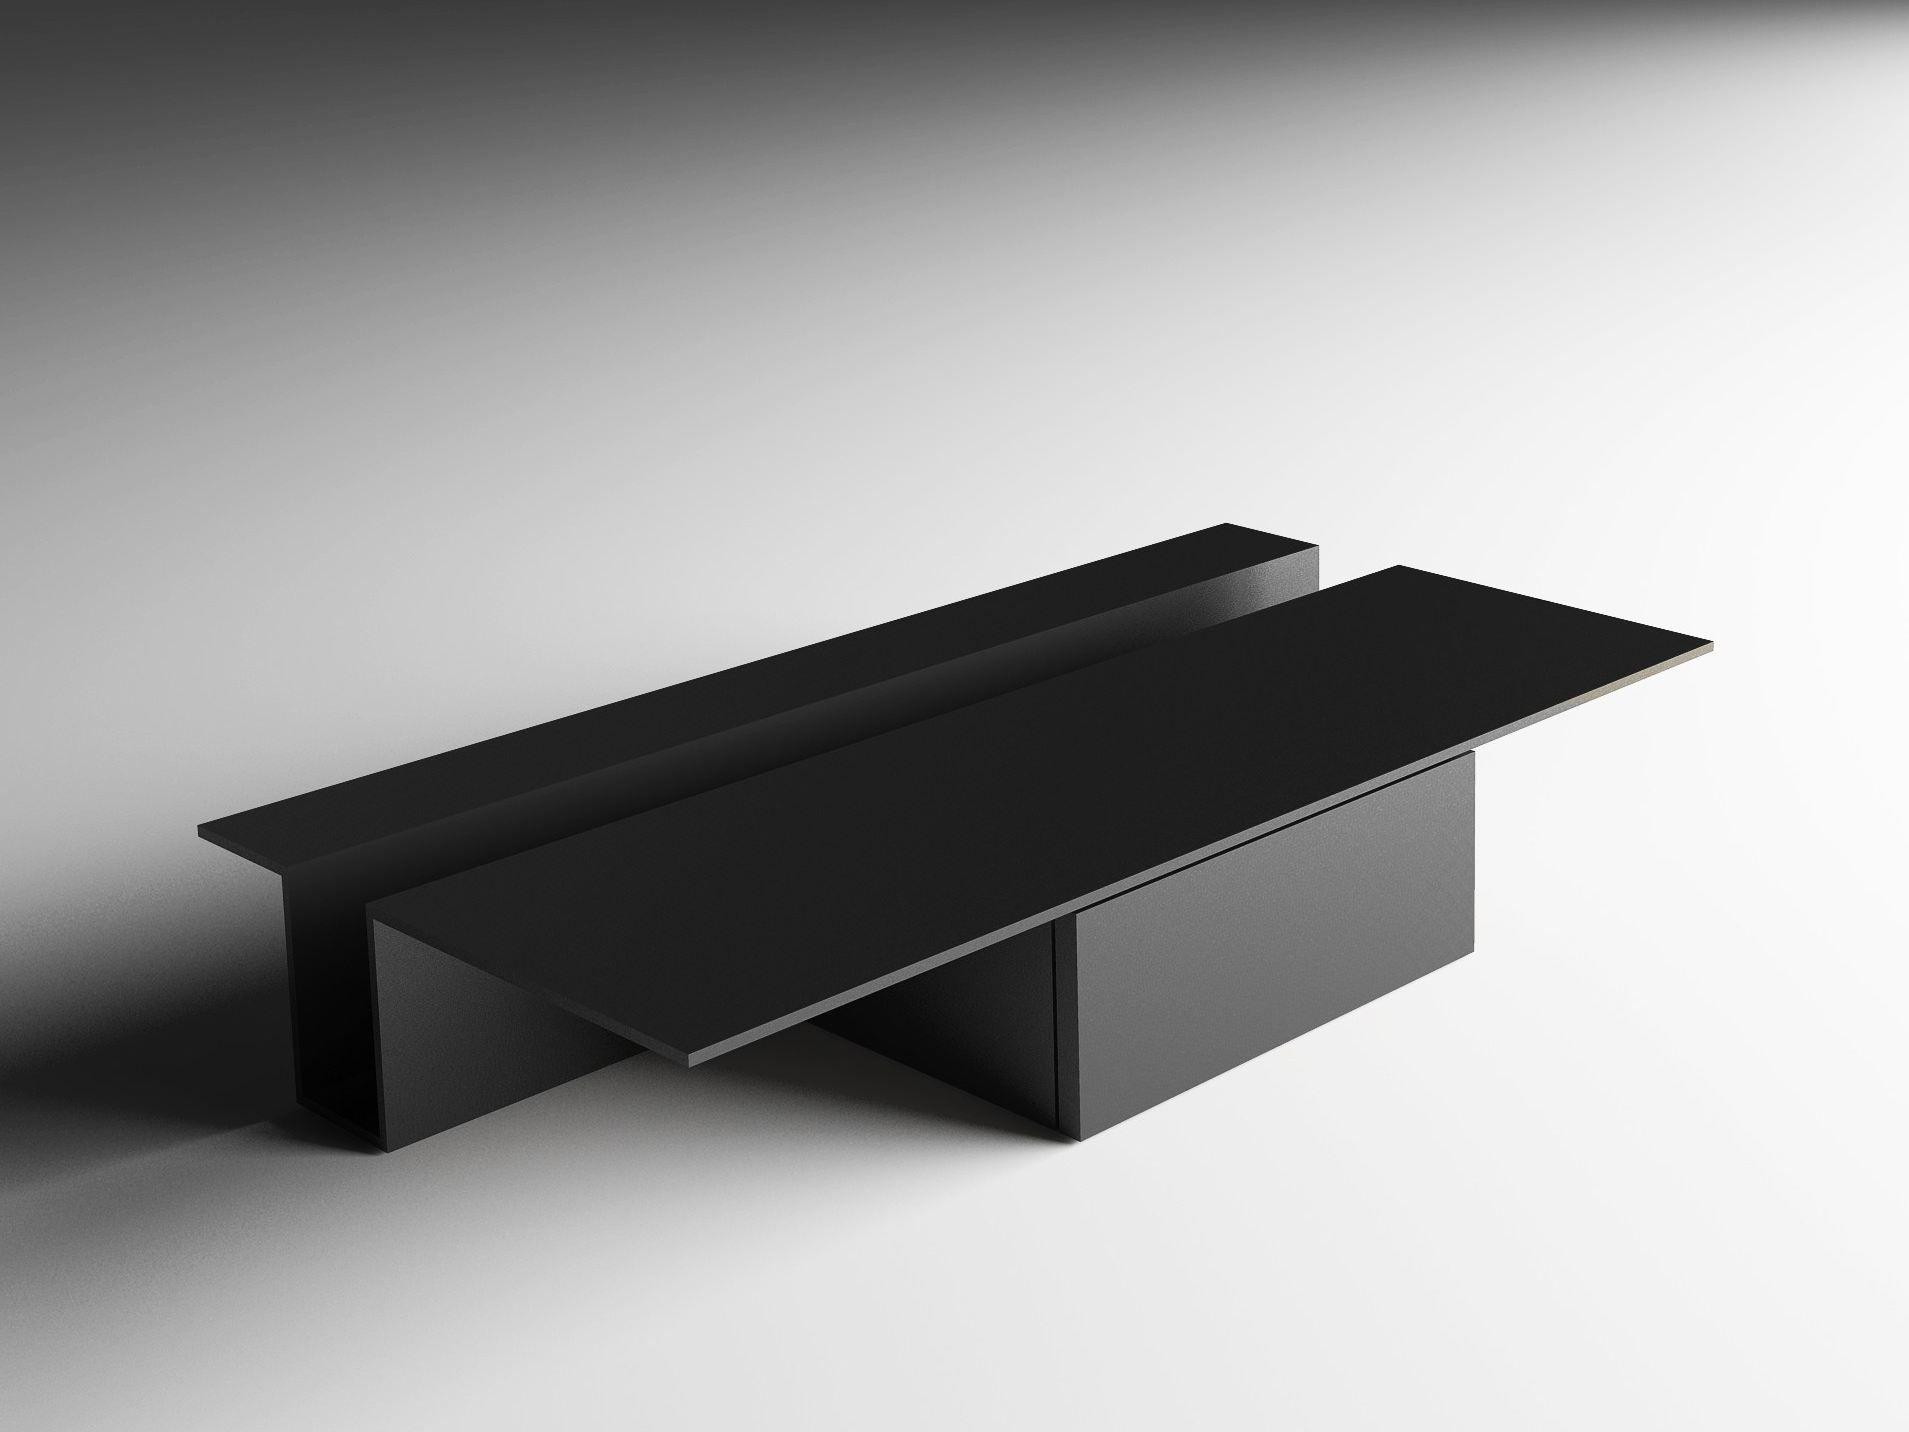 58f826b3337eb0e8277e88da90e5dde0 Incroyable De Table Basse Ajustable Schème